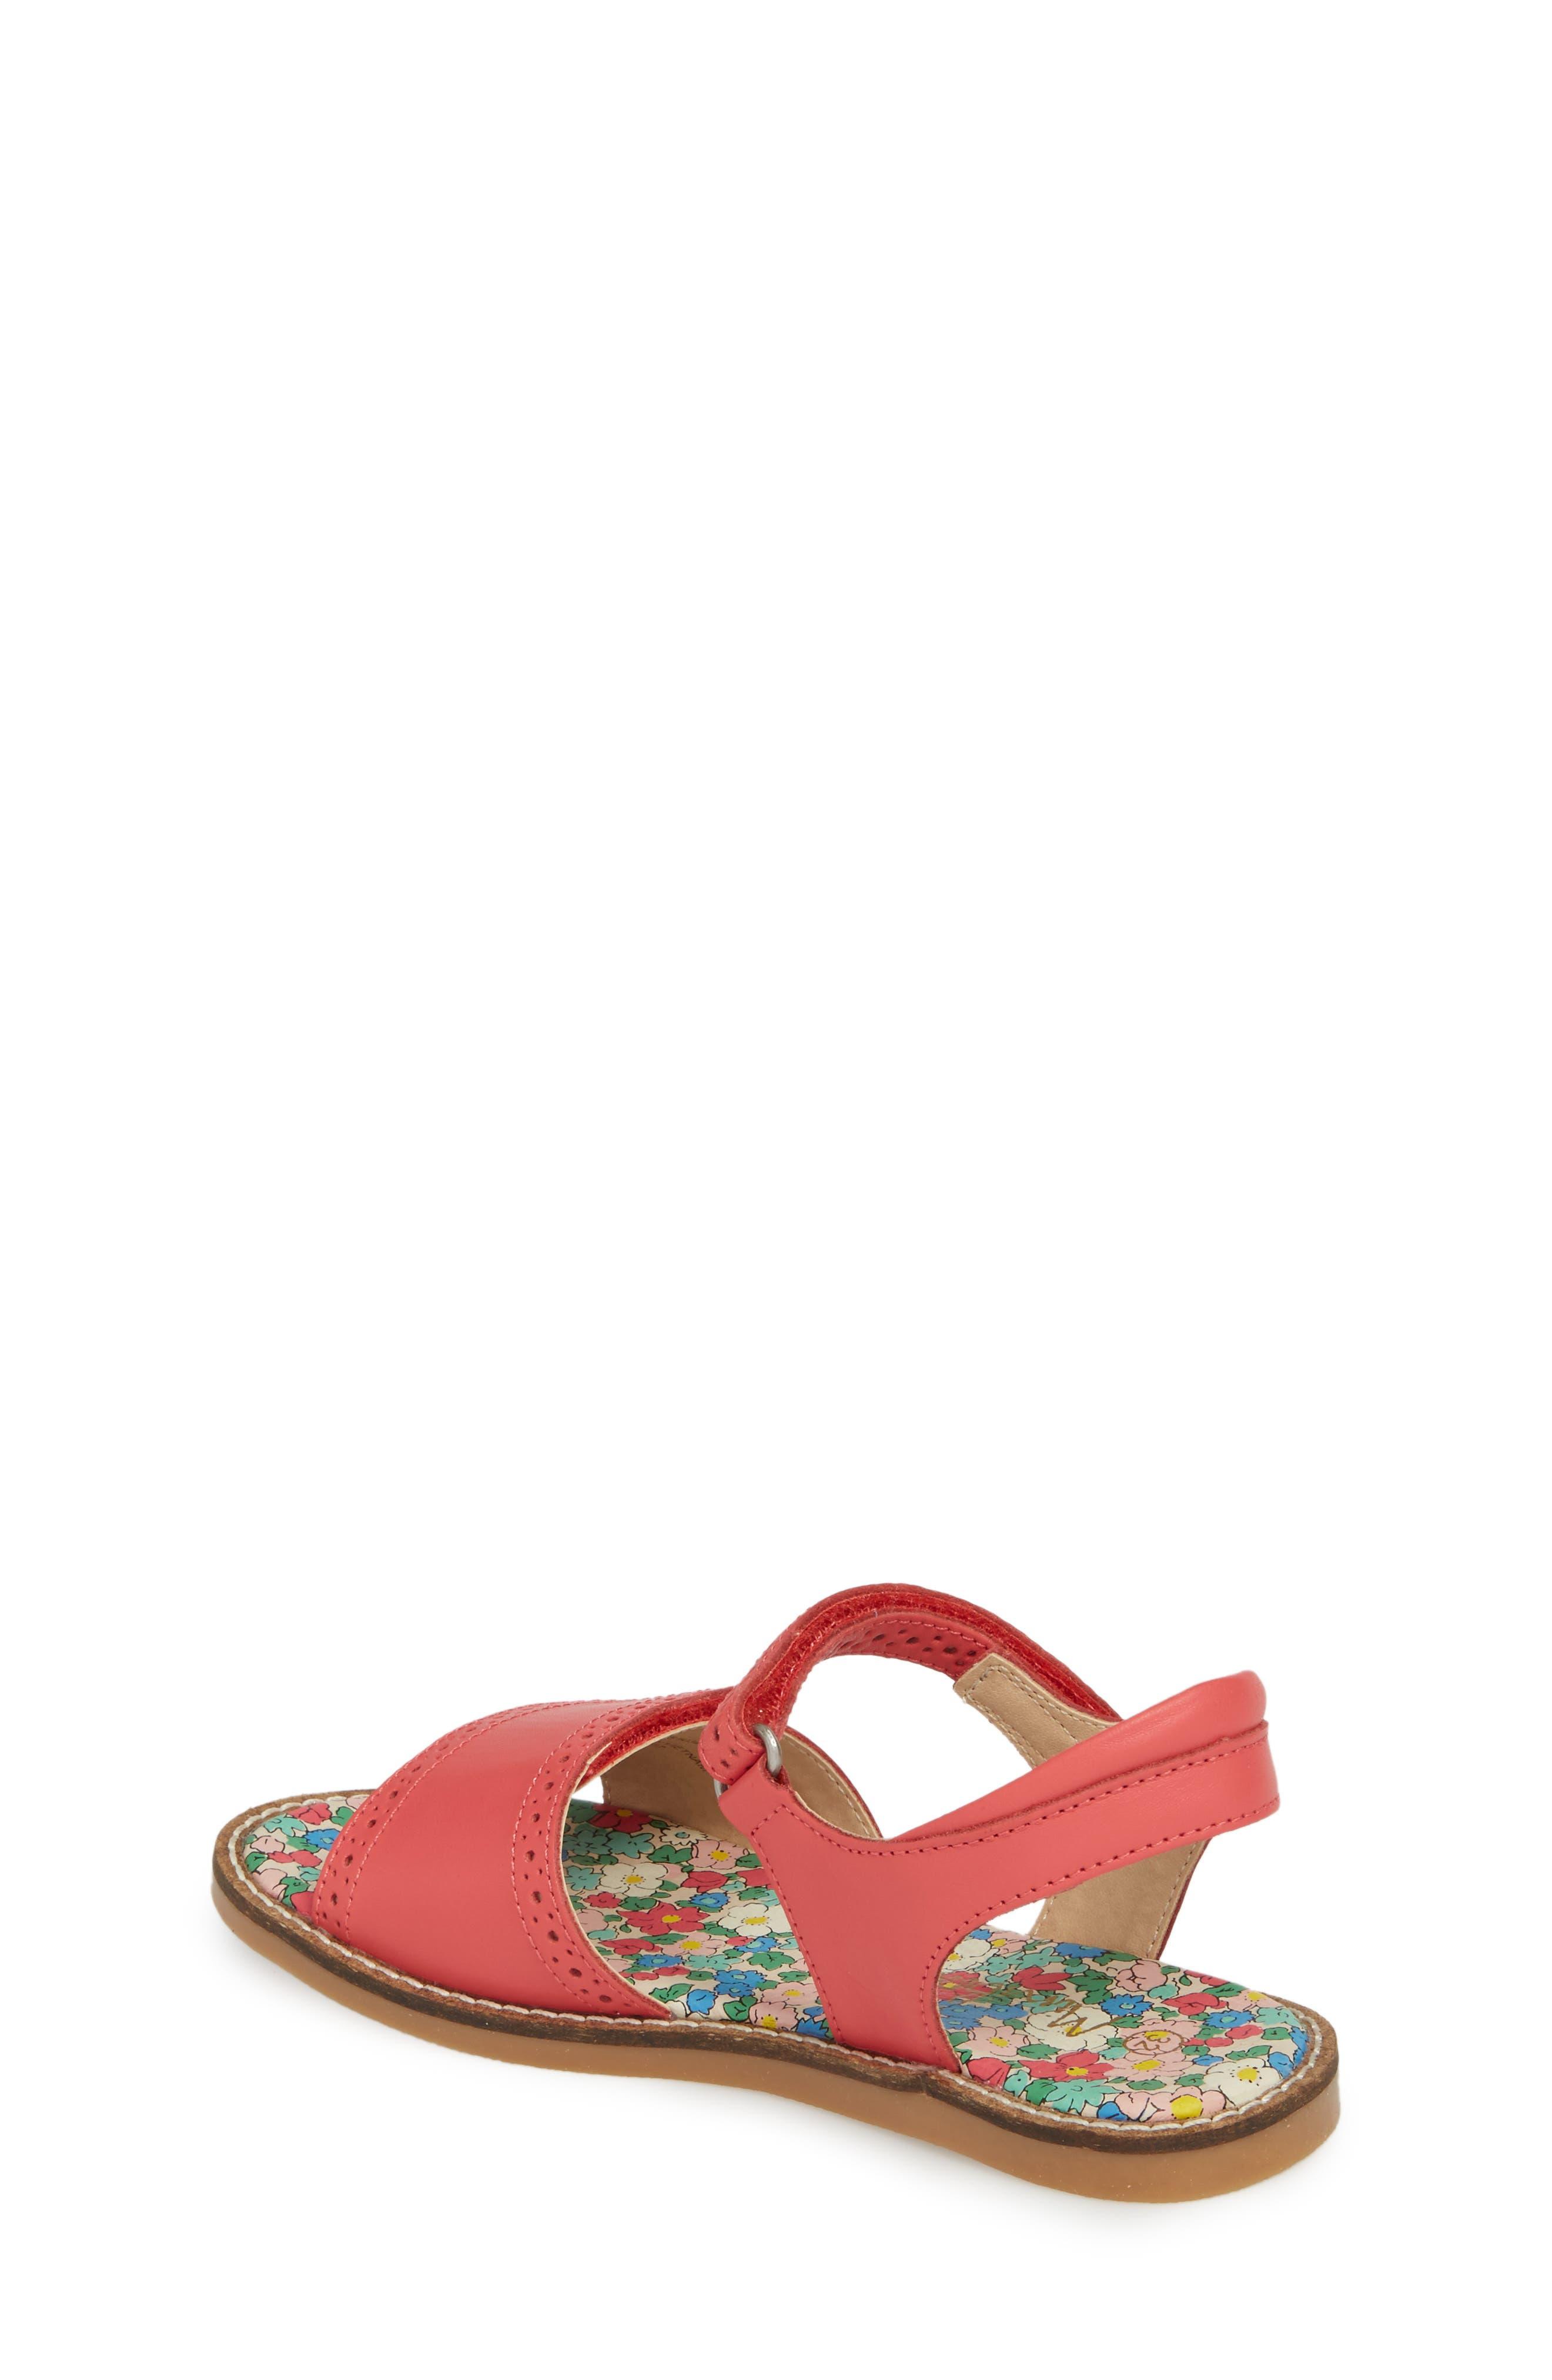 Adjustable Quarter Strap Sandal,                             Alternate thumbnail 4, color,